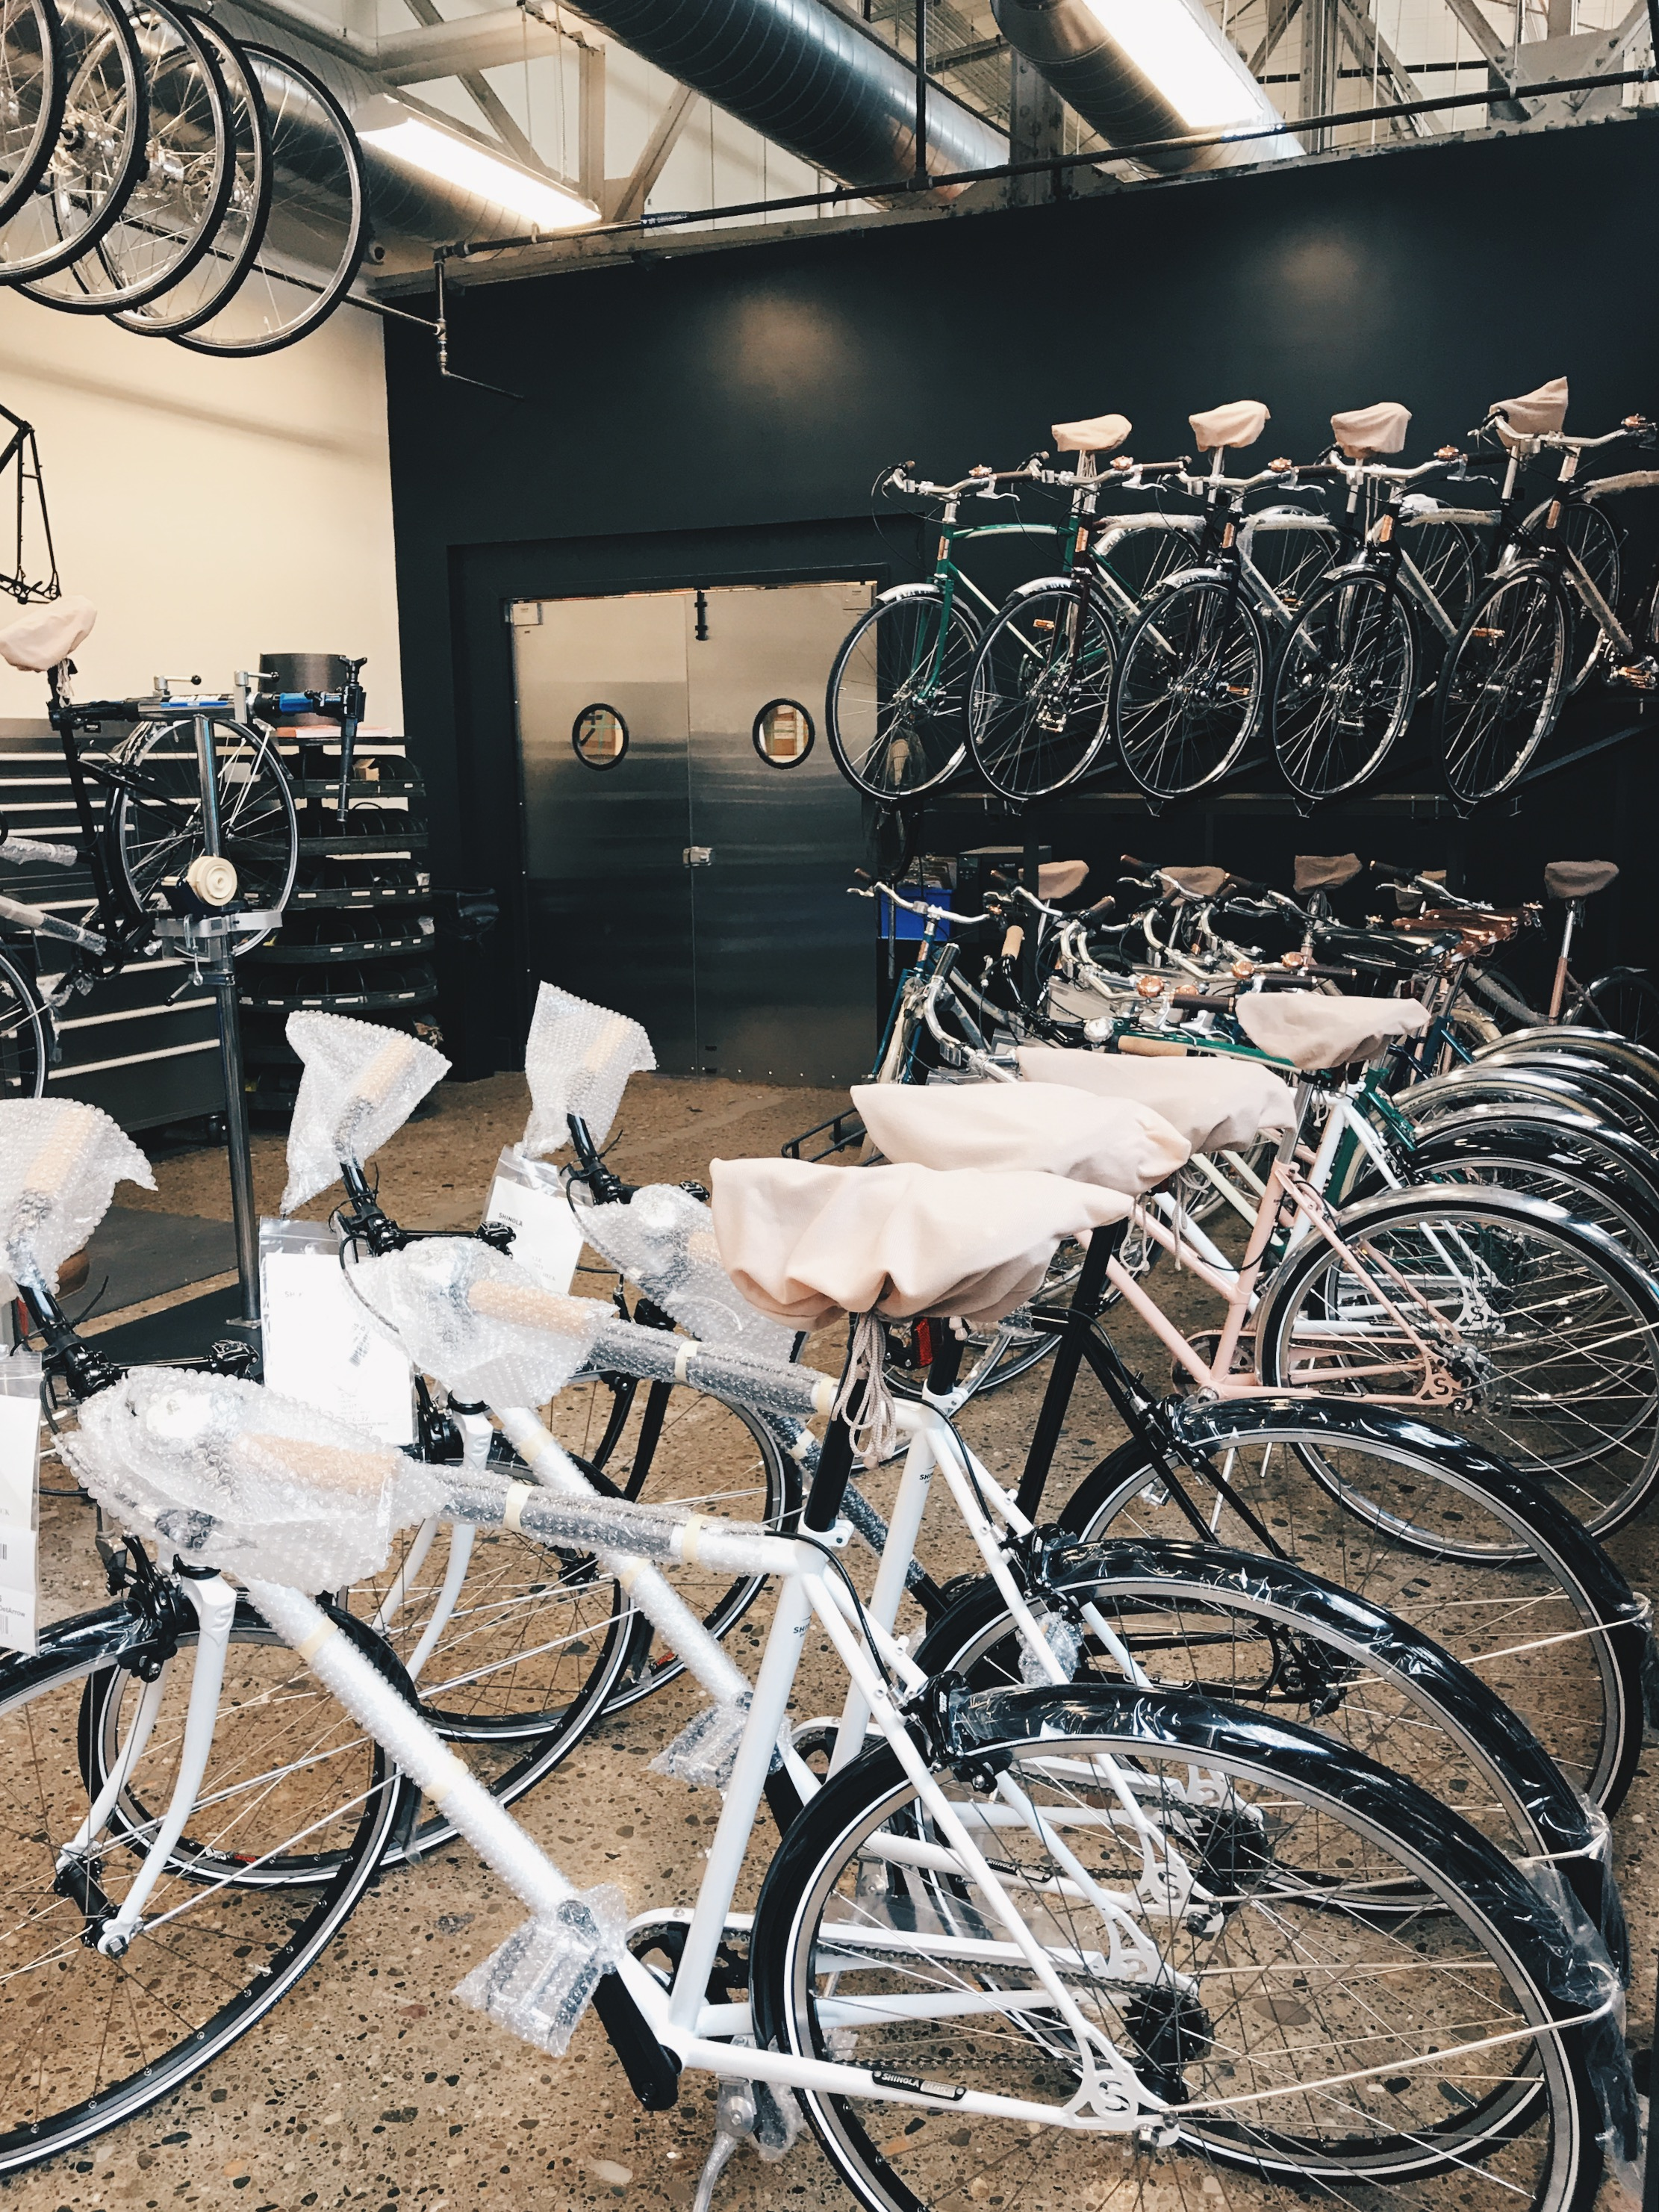 All Shinola bikes are custom made